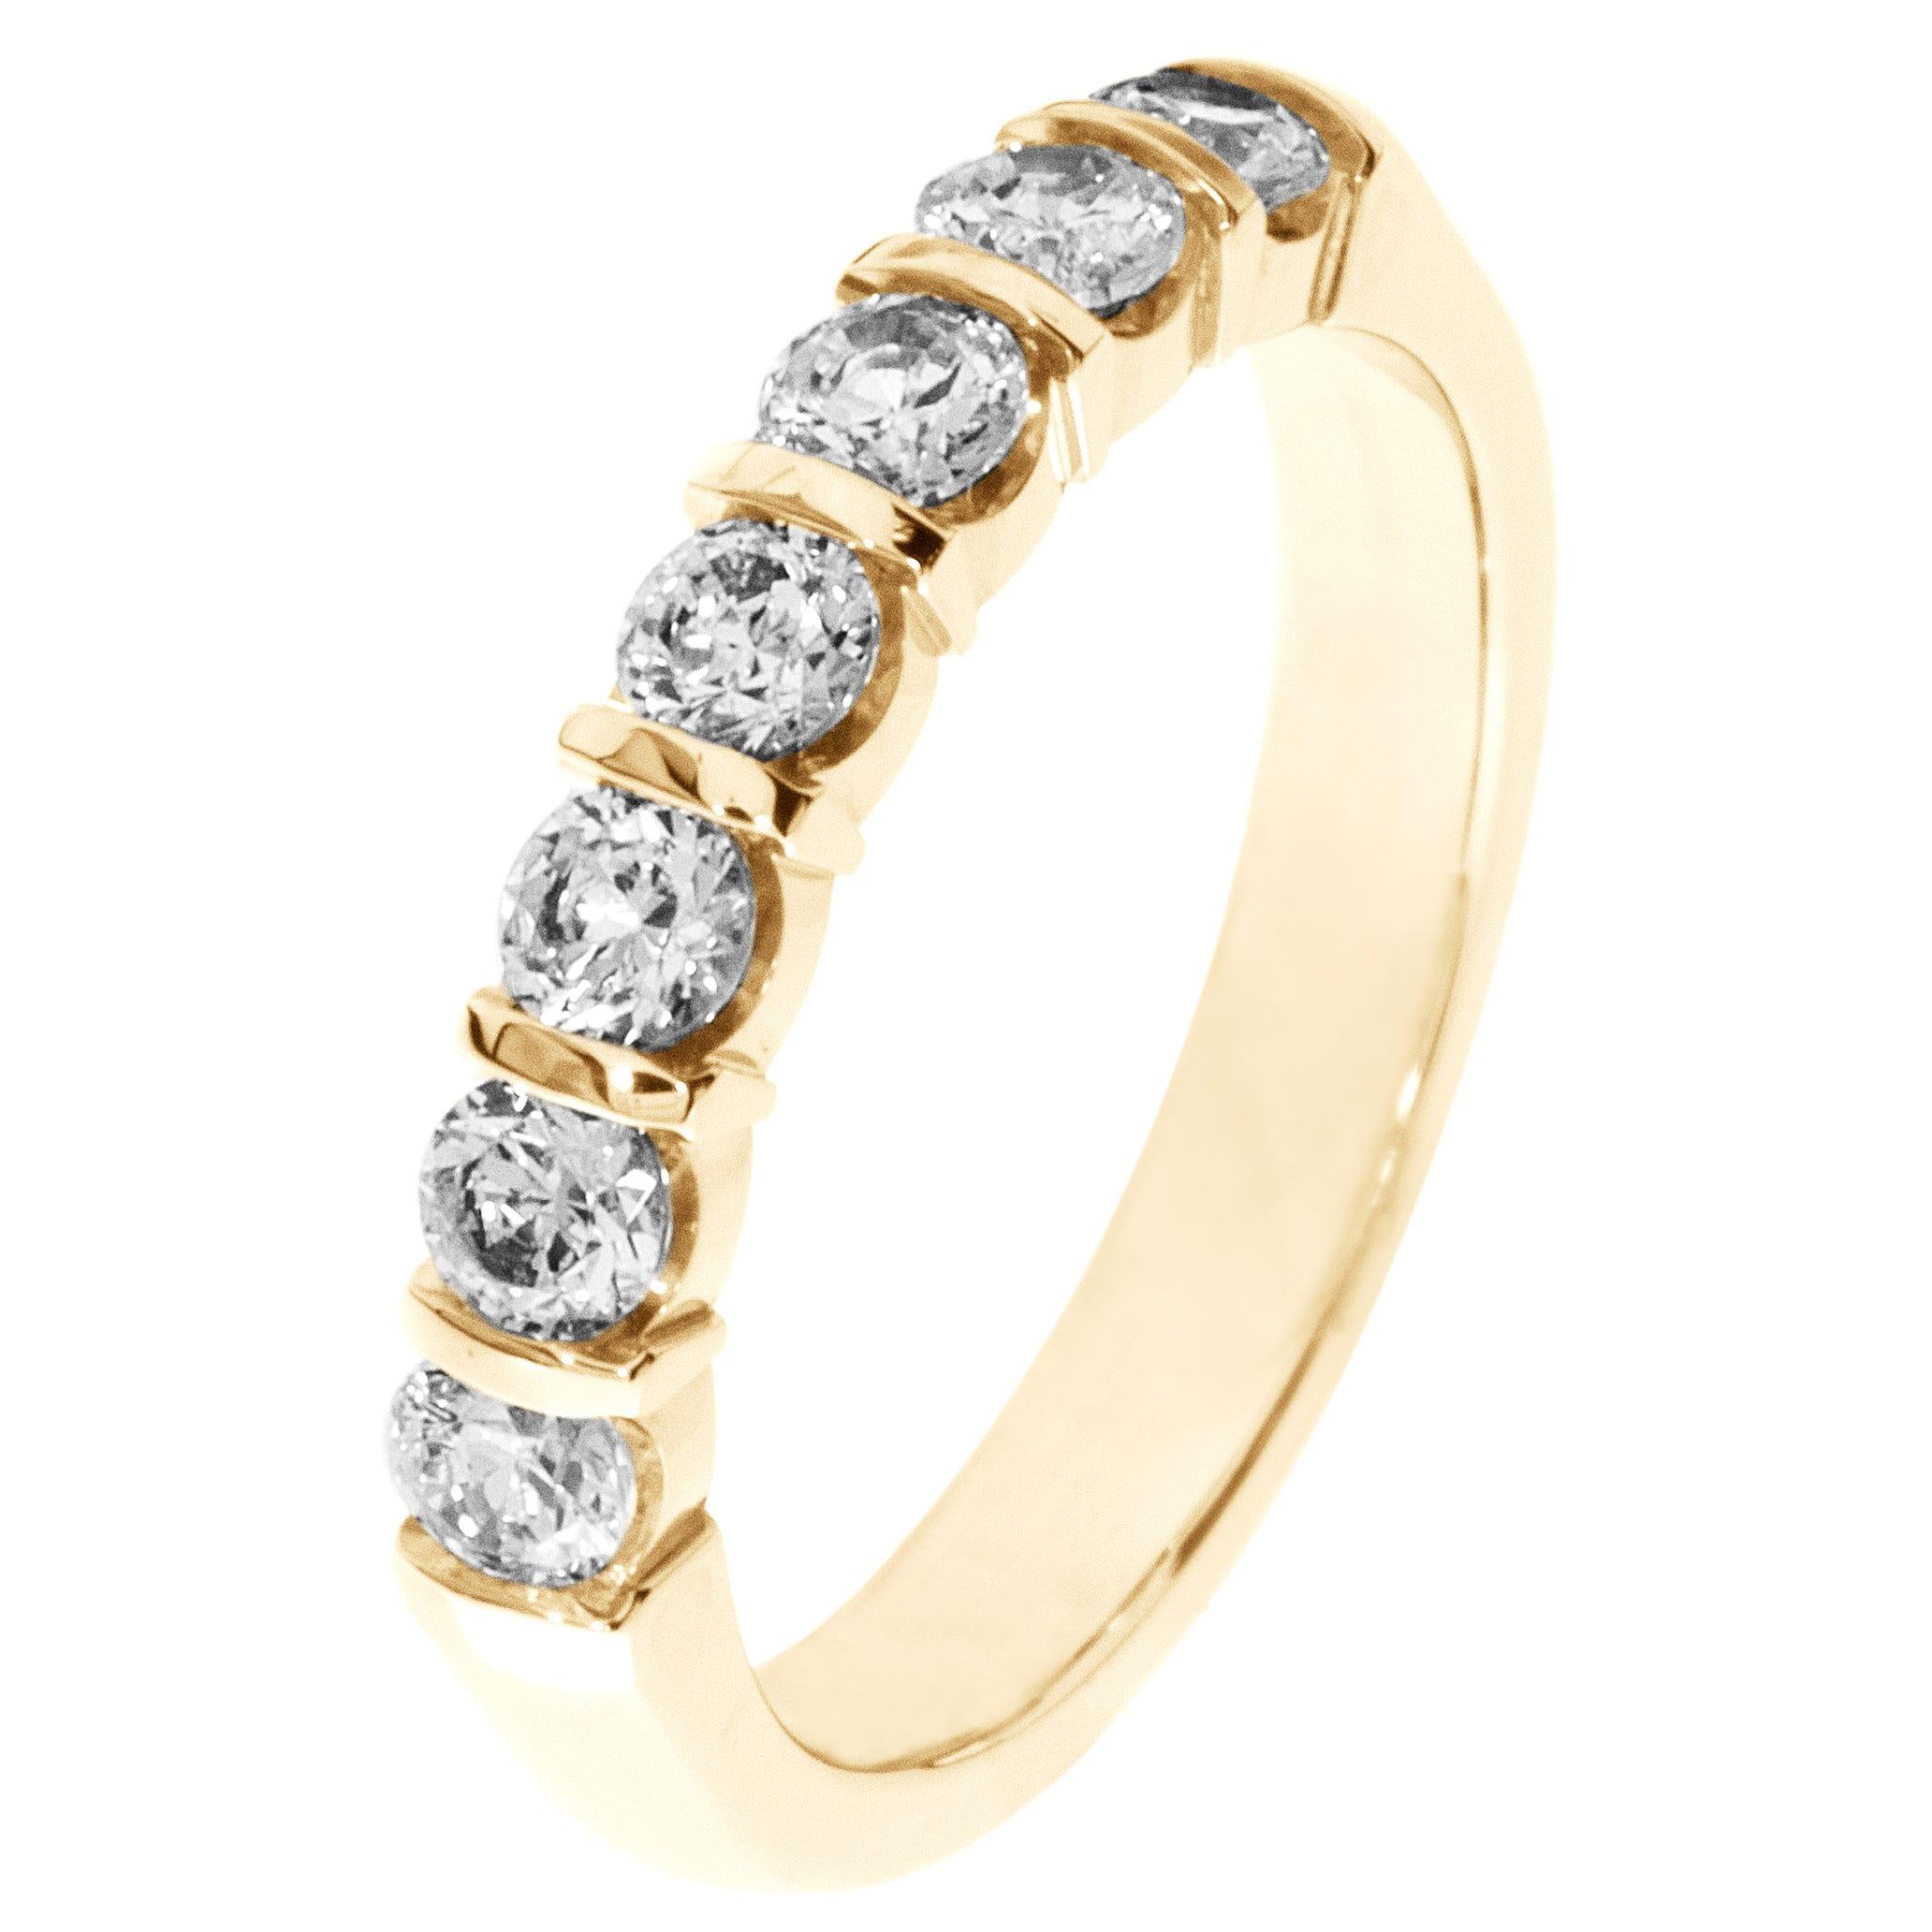 7-Stone Diamond Band 3/4ctw. (G-H, SI) 18K Yellow Gold